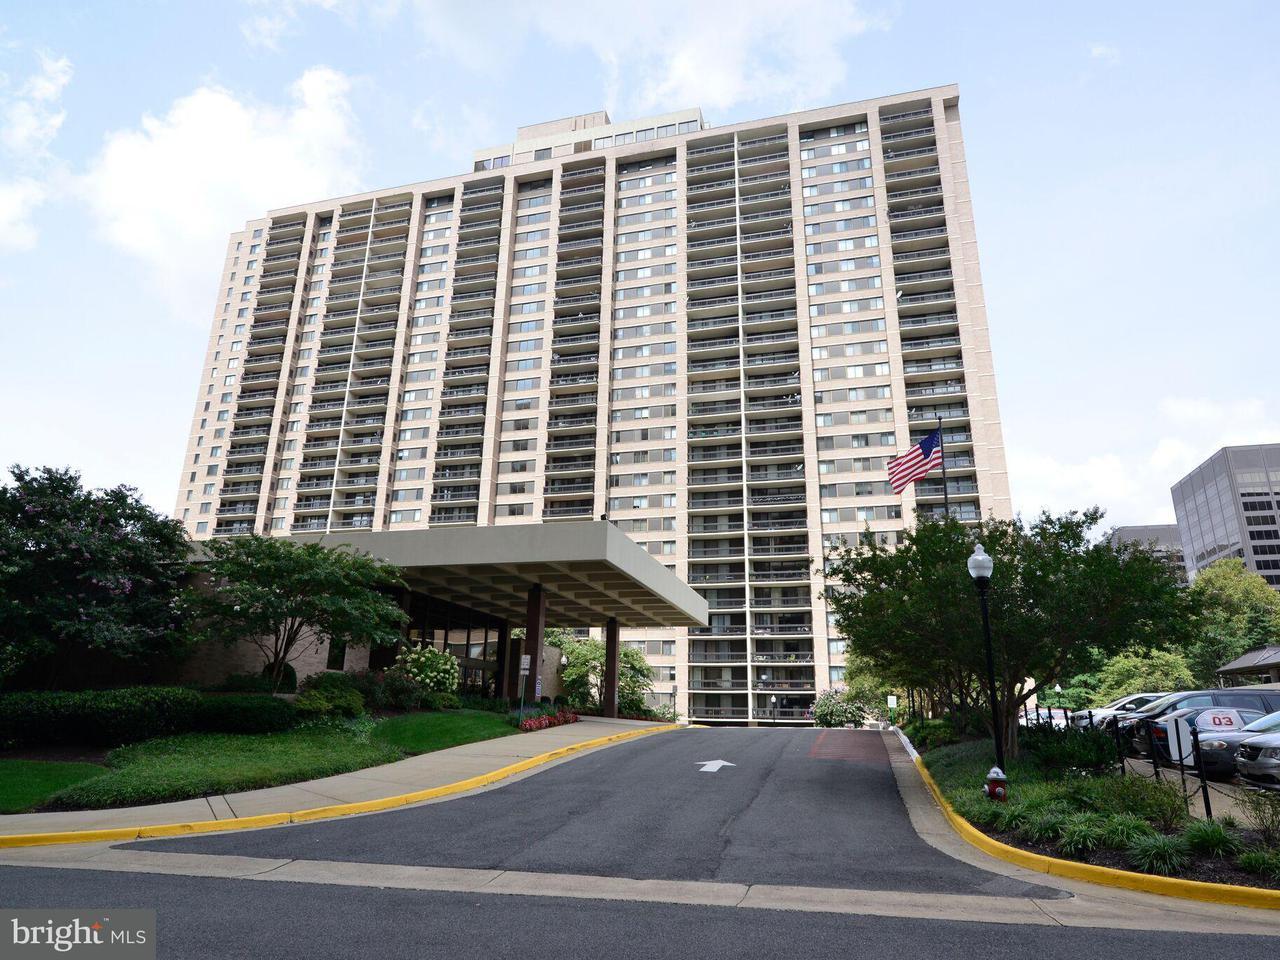 Appartement en copropriété pour l Vente à 5505 Seminary Rd #2512n 5505 Seminary Rd #2512n Falls Church, Virginia 22041 États-Unis